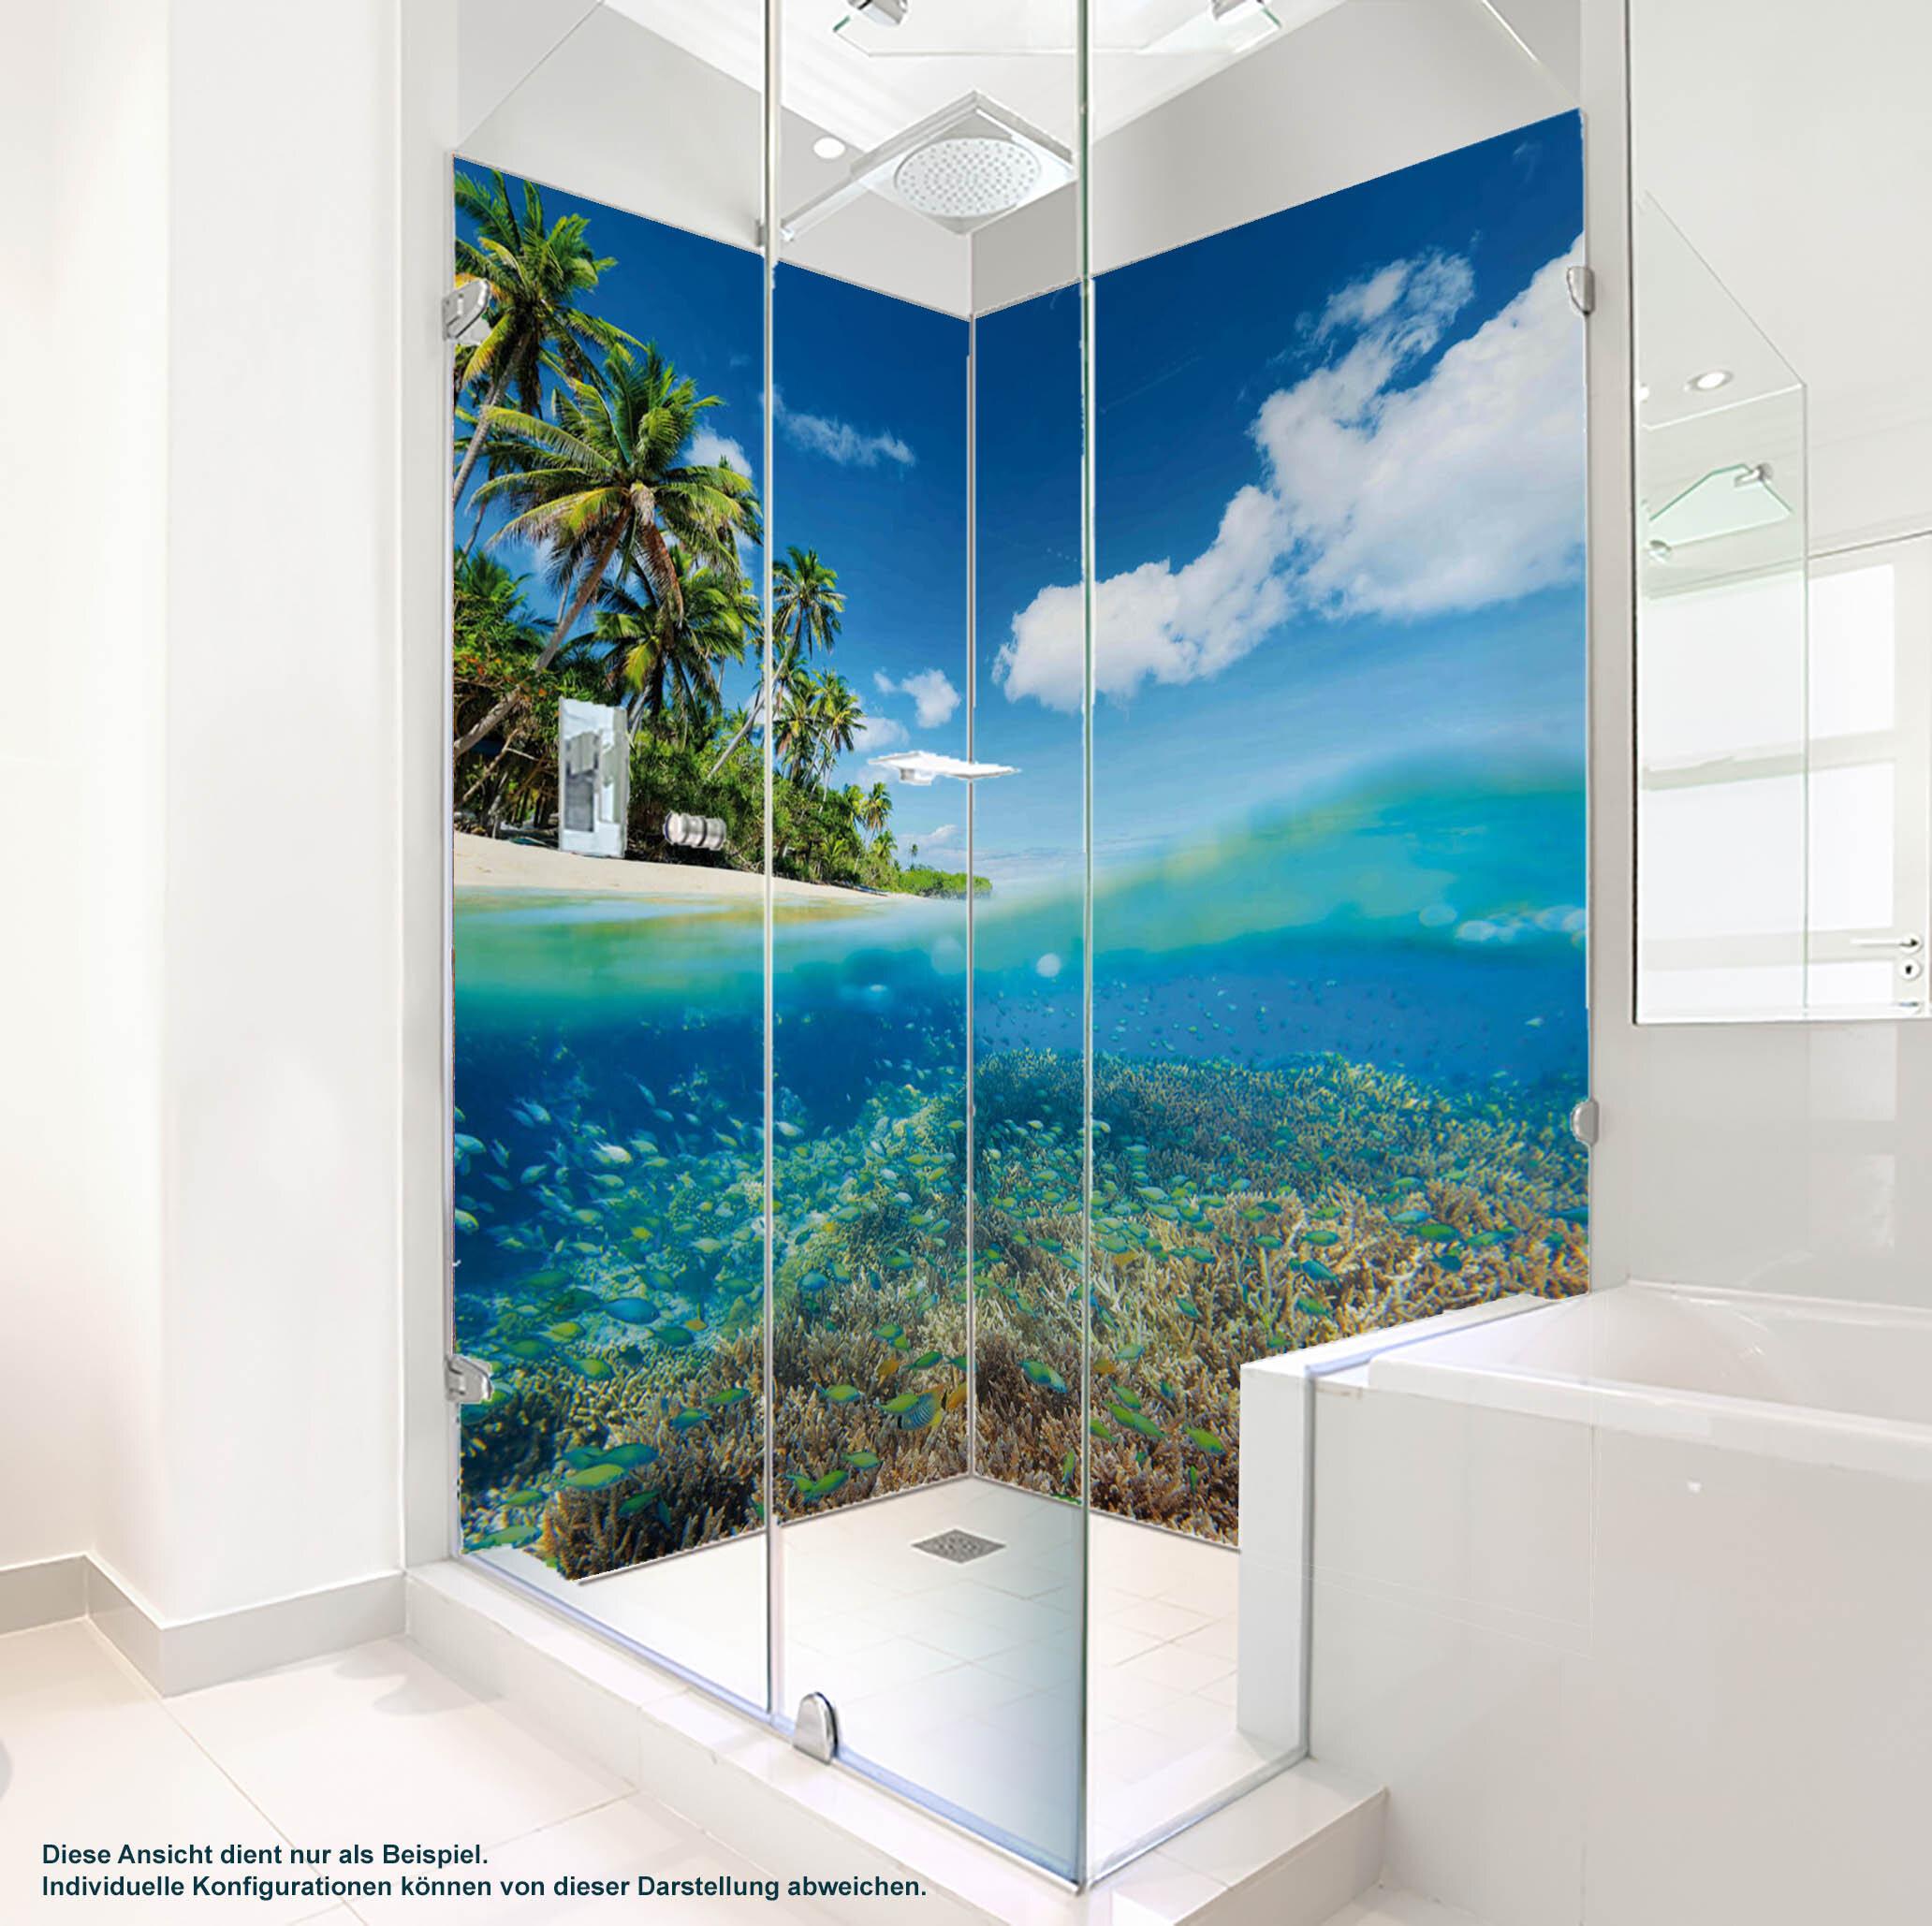 Dusche PlateART Duschrückwand mit Motiv Strand und Meer K_12_18